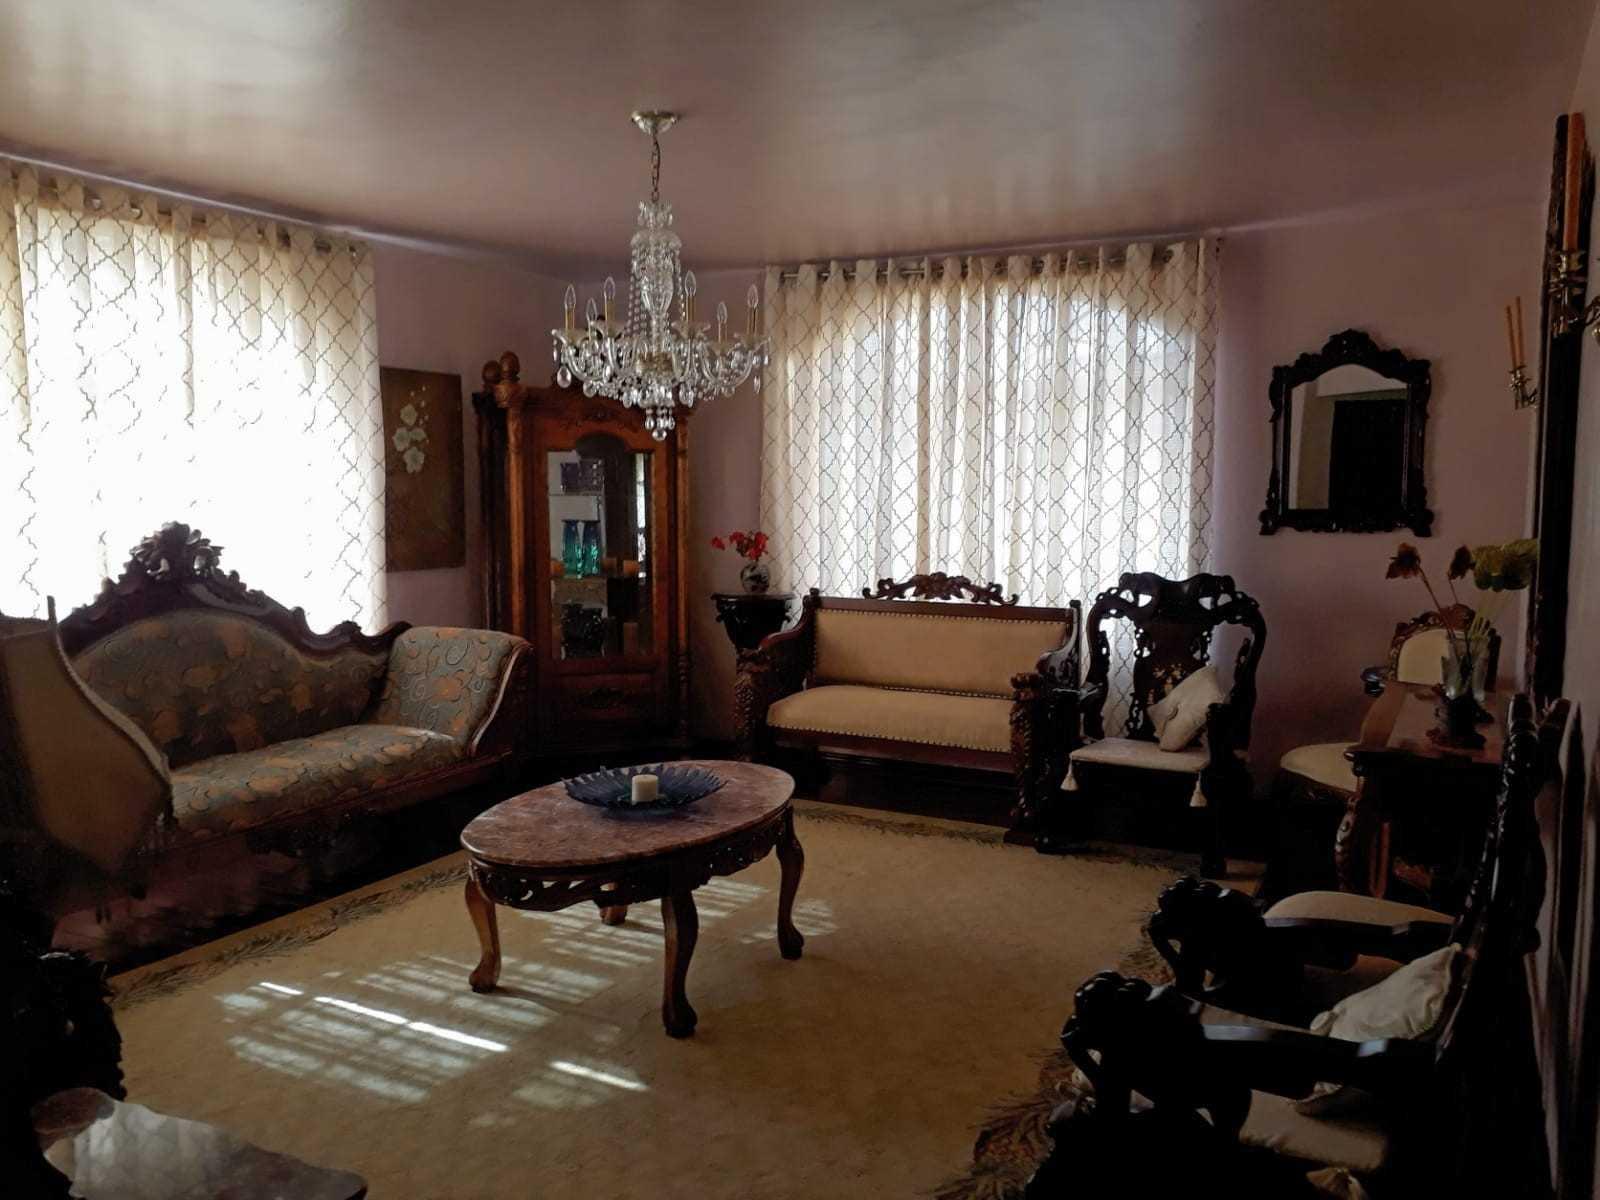 Lot C1A Pleasant Hall Hts, Barbados Z4604398